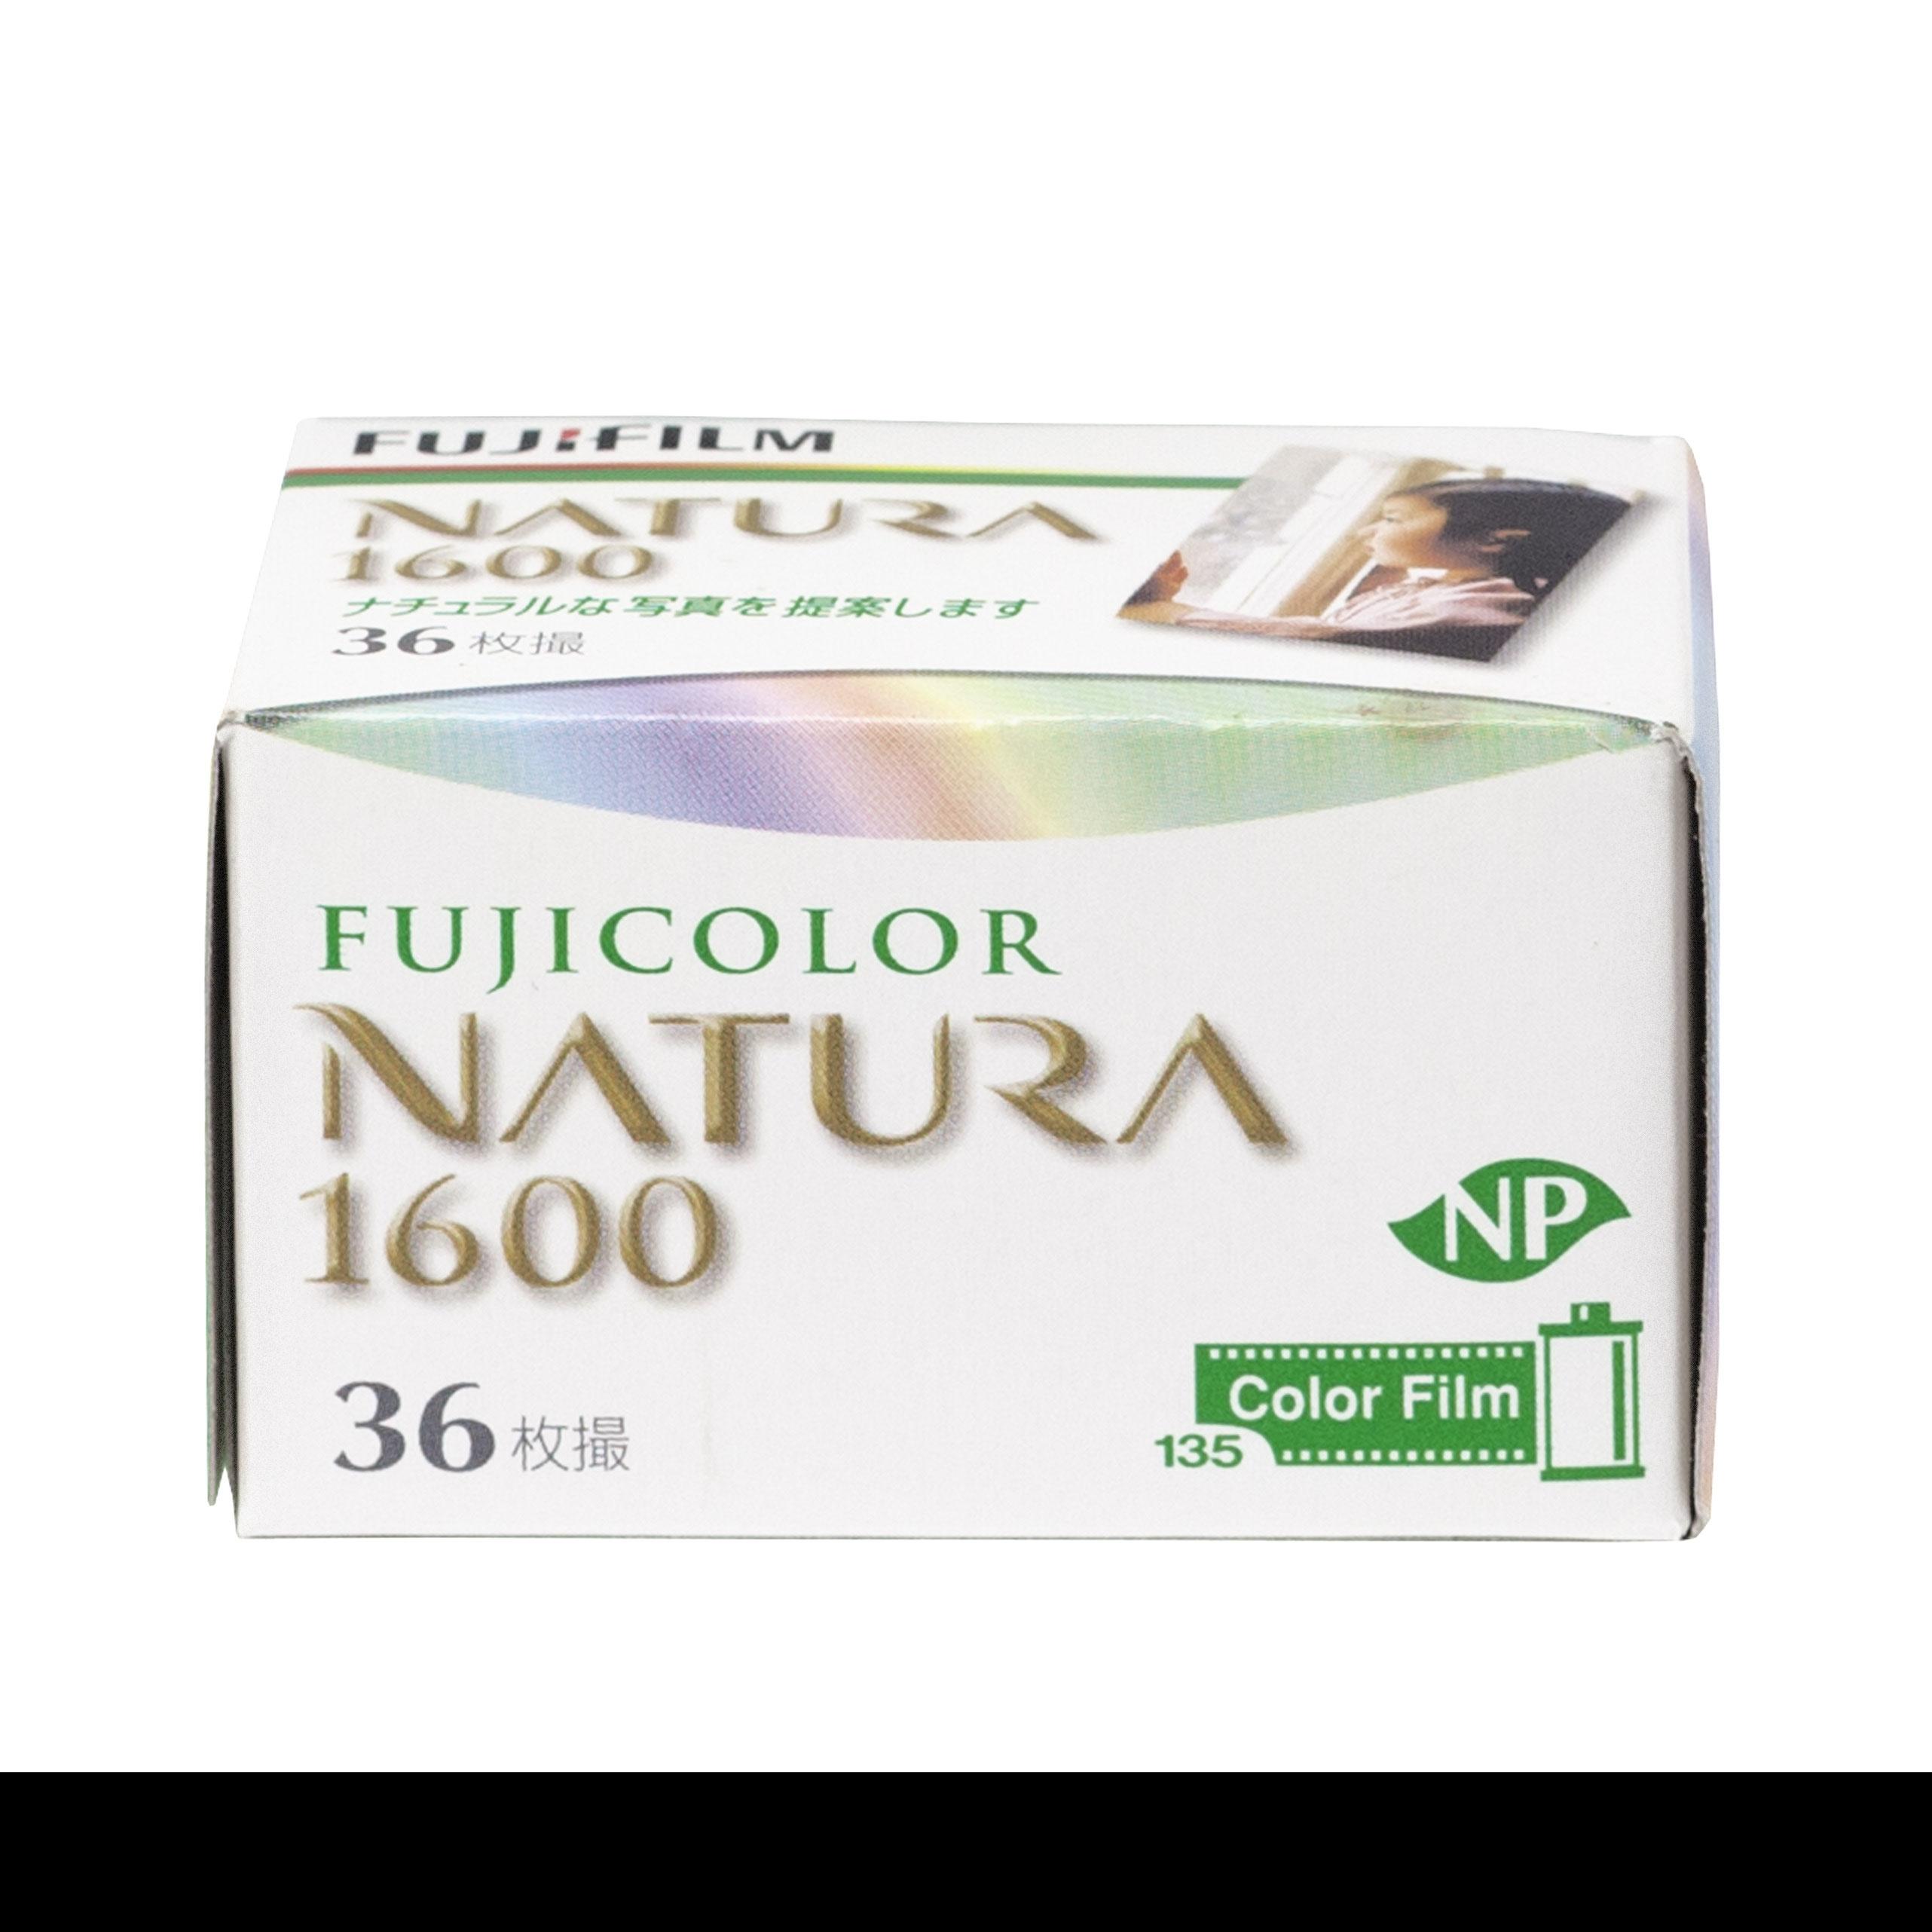 FUJIFILM : NATURA 1600